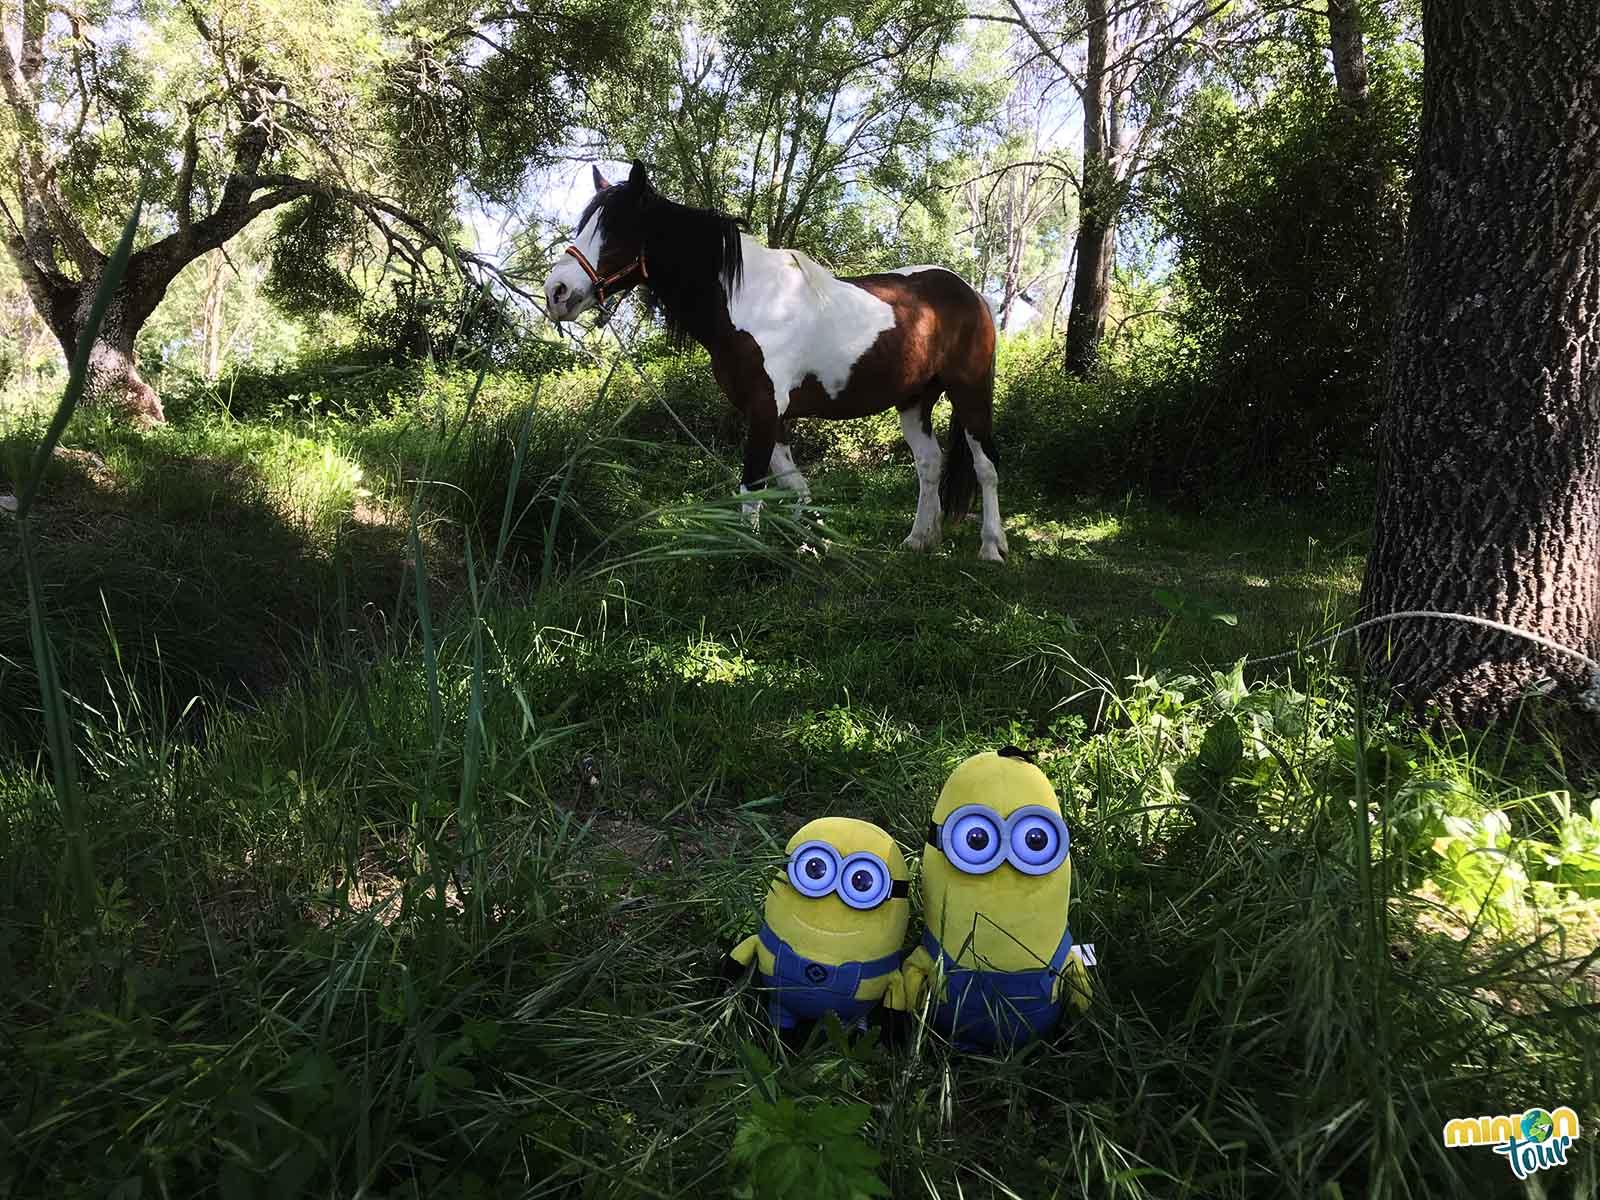 Un caballo y 2 Minions en Escalona